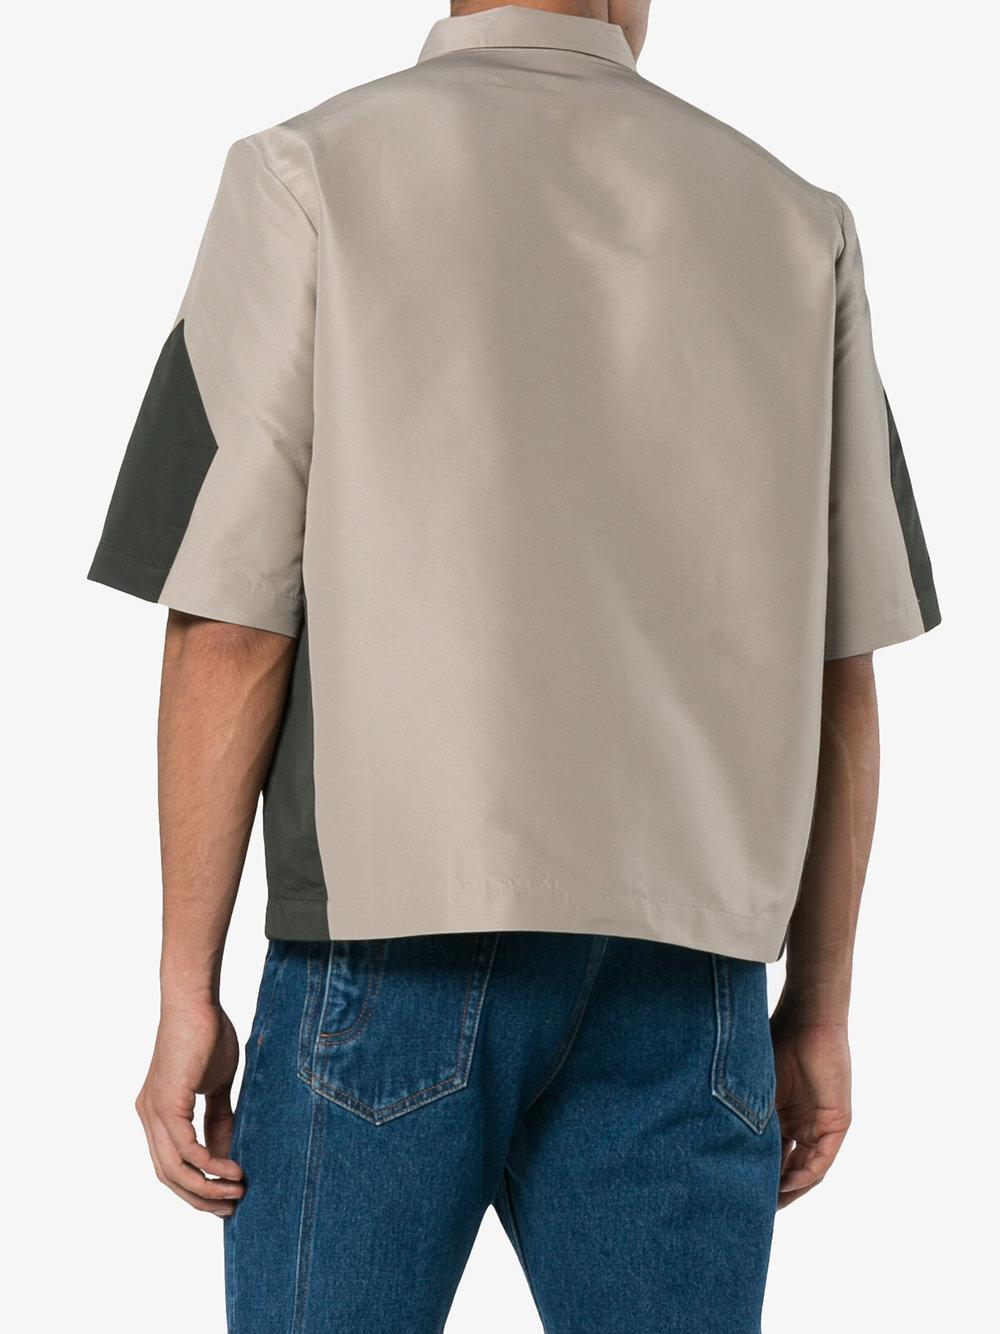 EX Infinitas Xanax Zipped Shirt Jacket in Beige (Natural) for Men